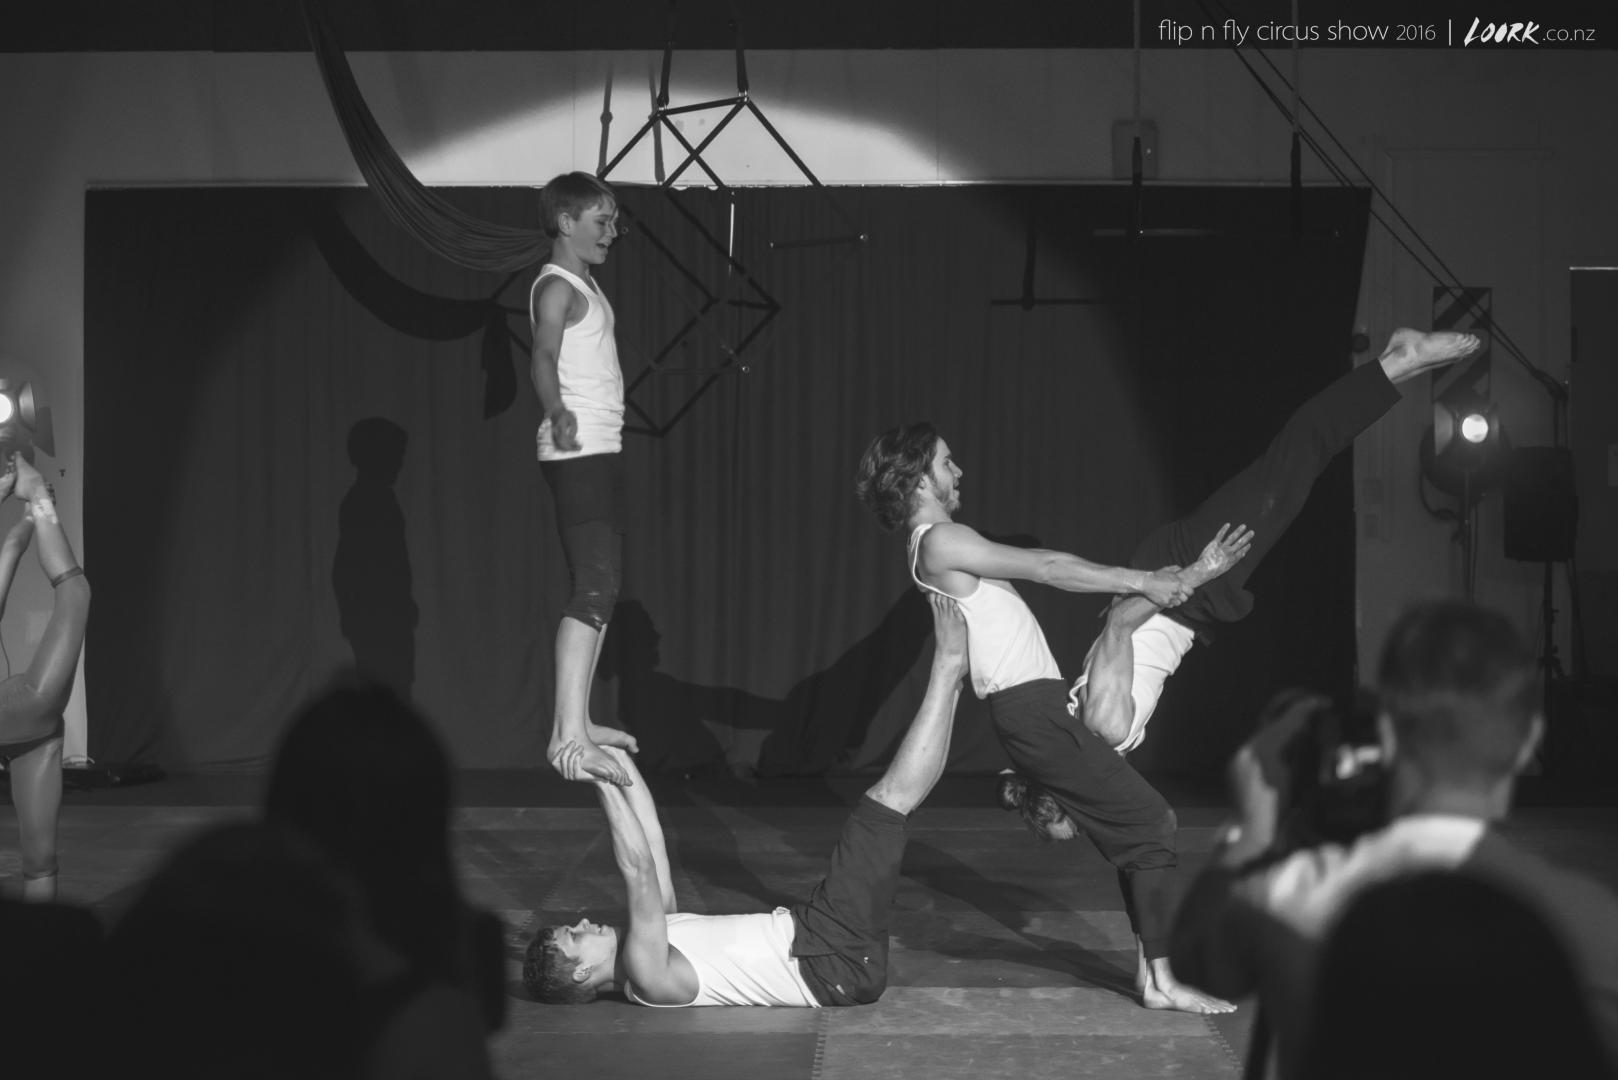 Handstand/Tumbling